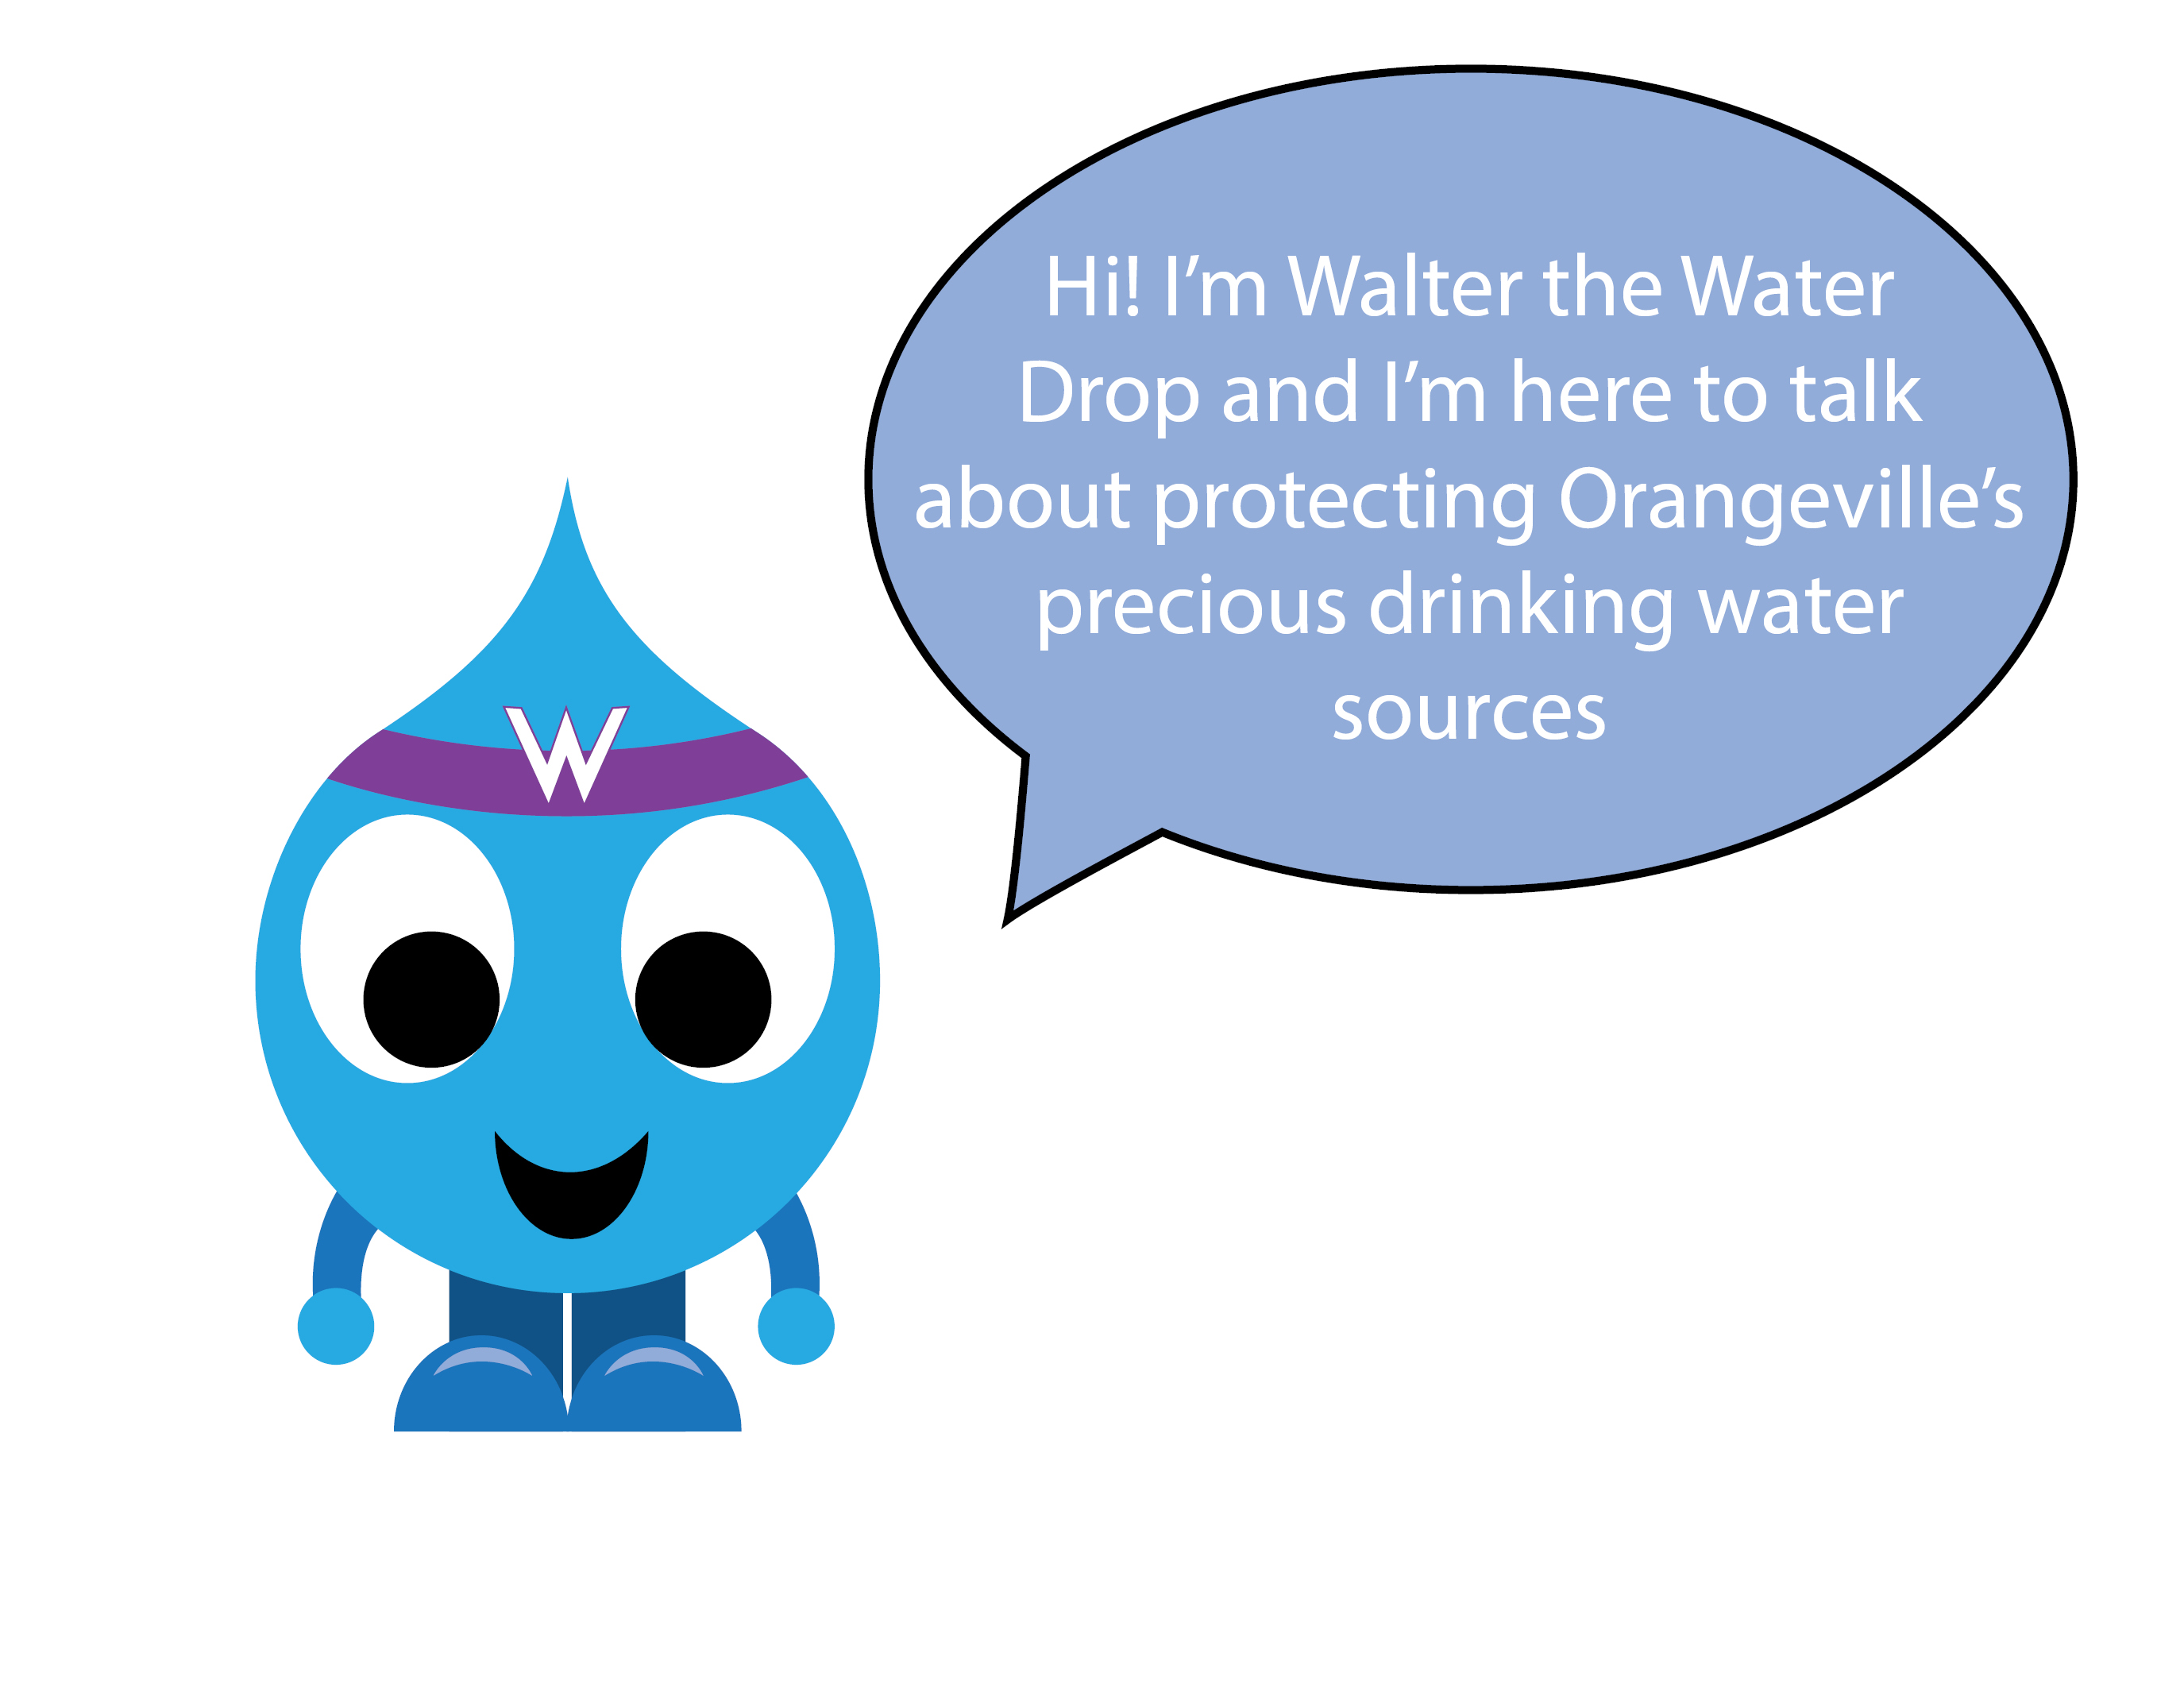 Valley clipart source water Water » Orangeville Walter Office